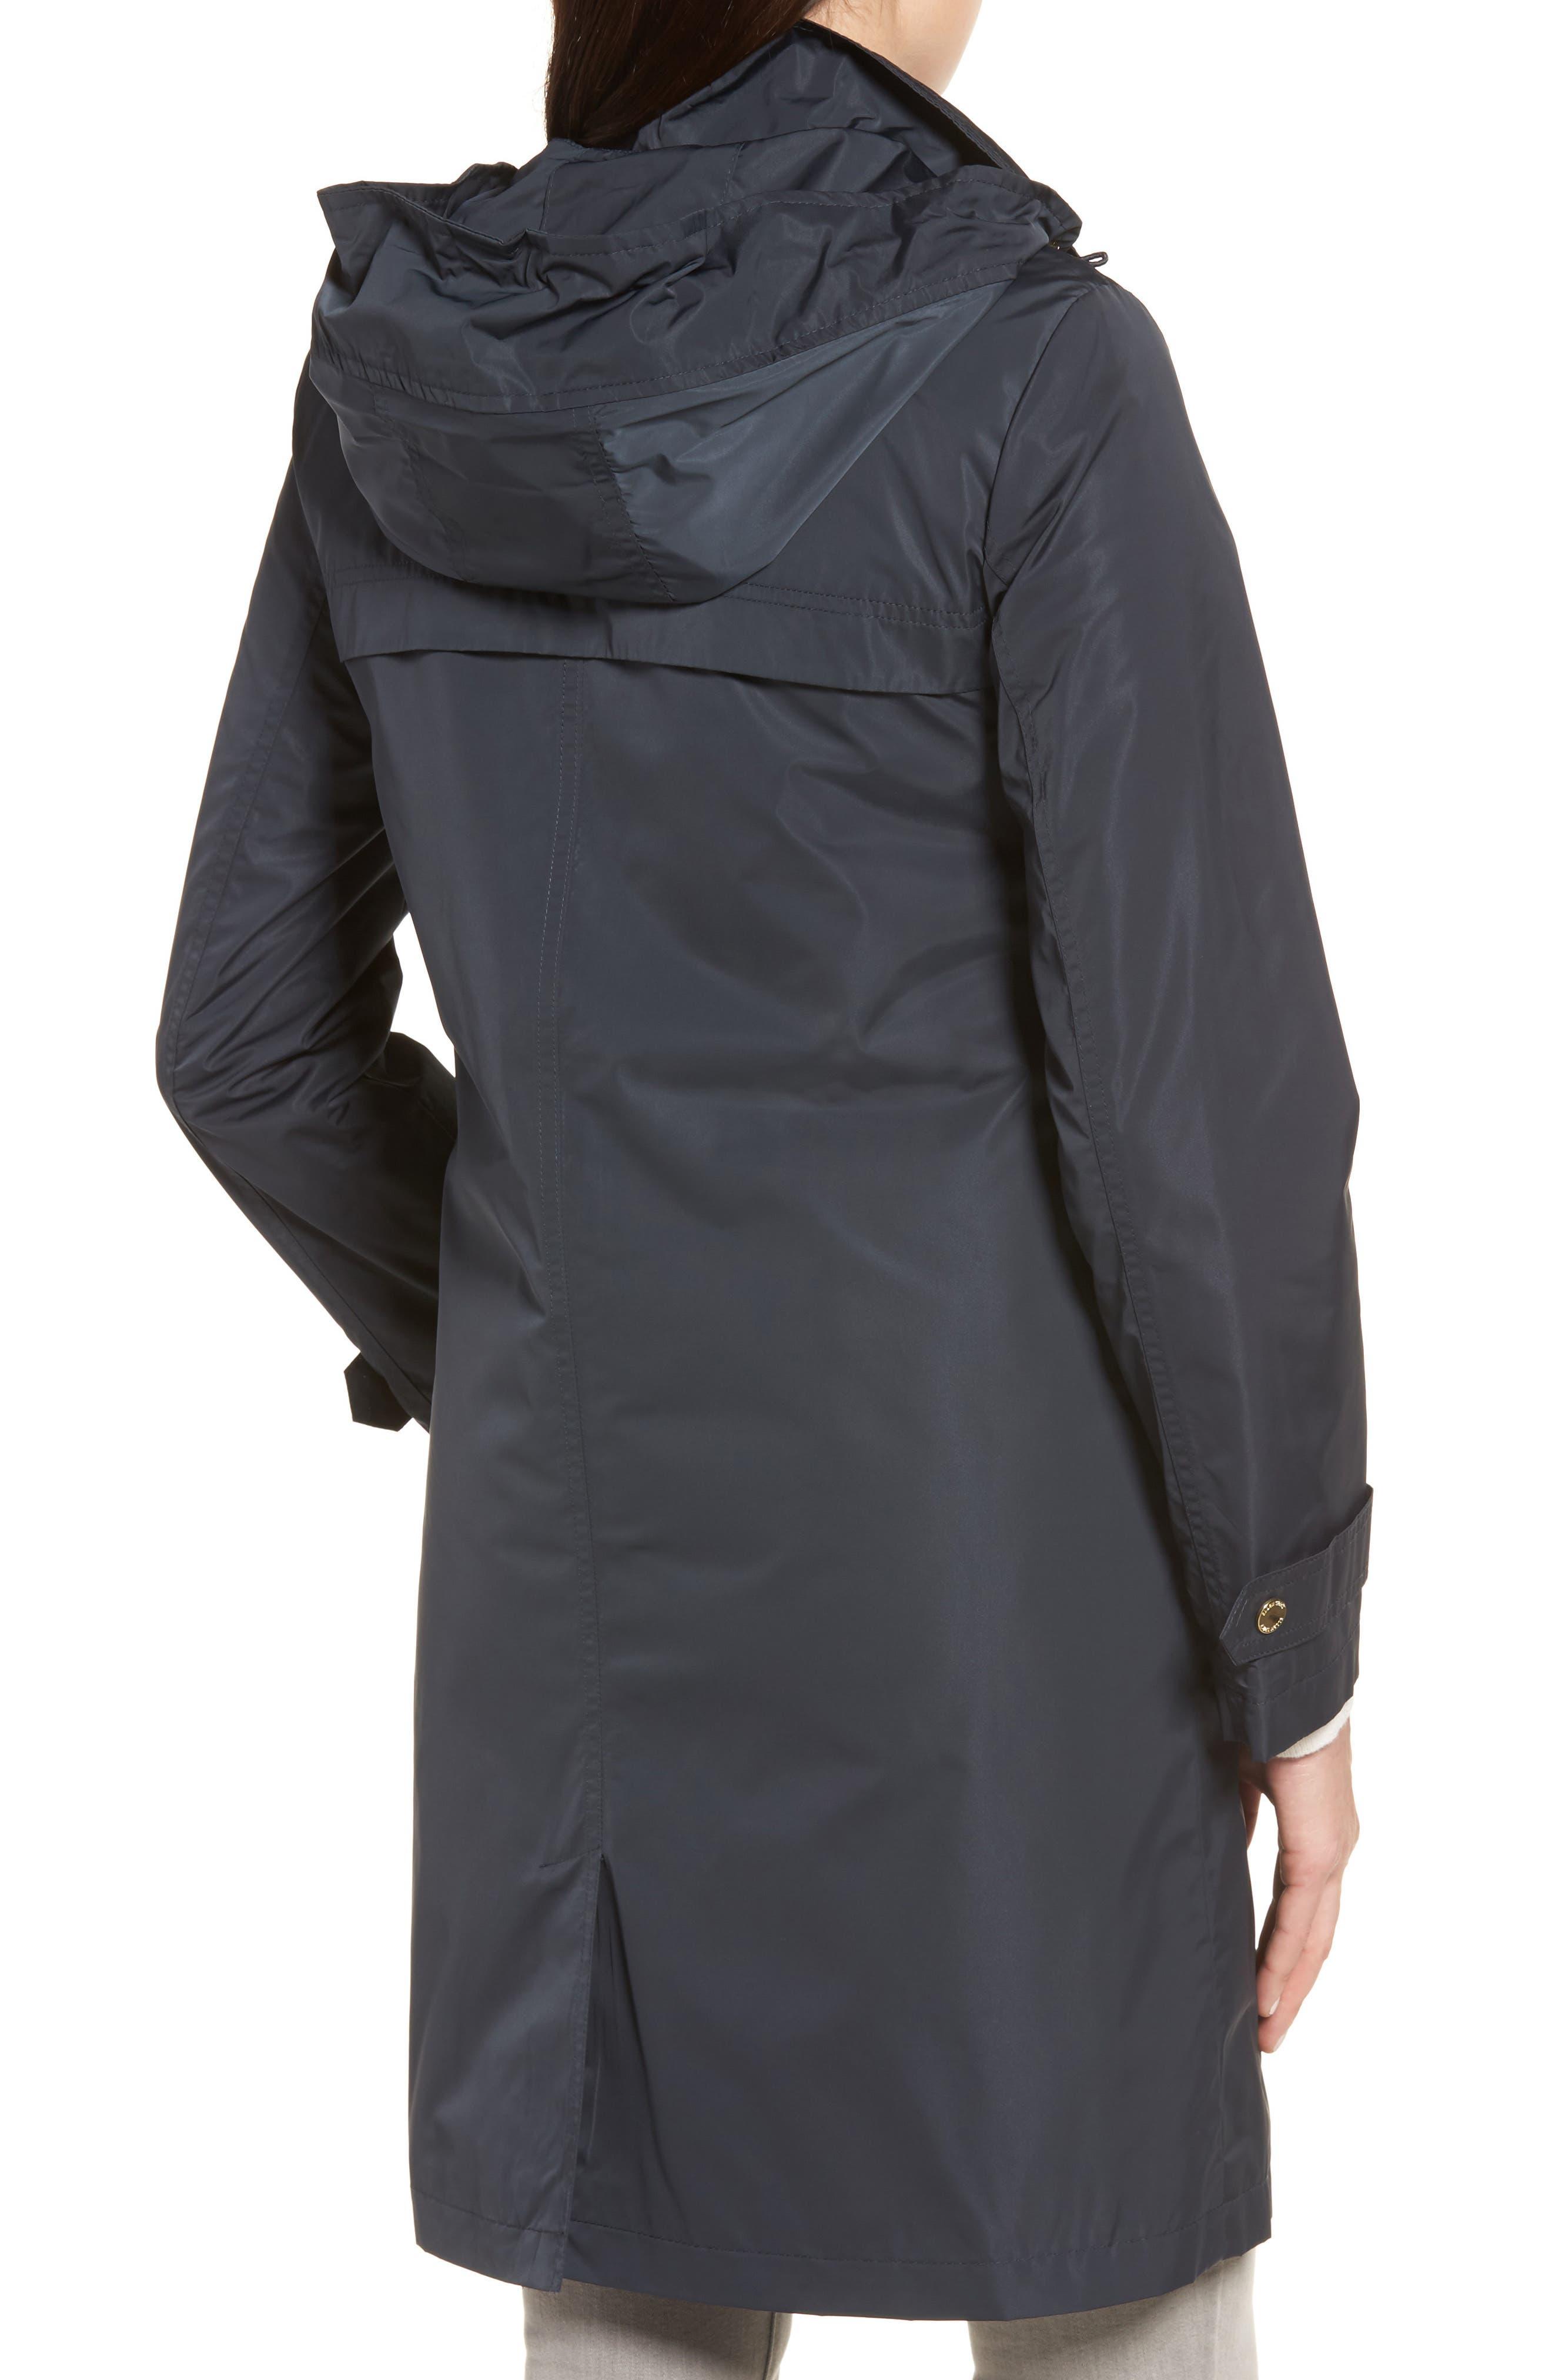 Raincoat with Detachable Hood,                             Alternate thumbnail 2, color,                             Navy